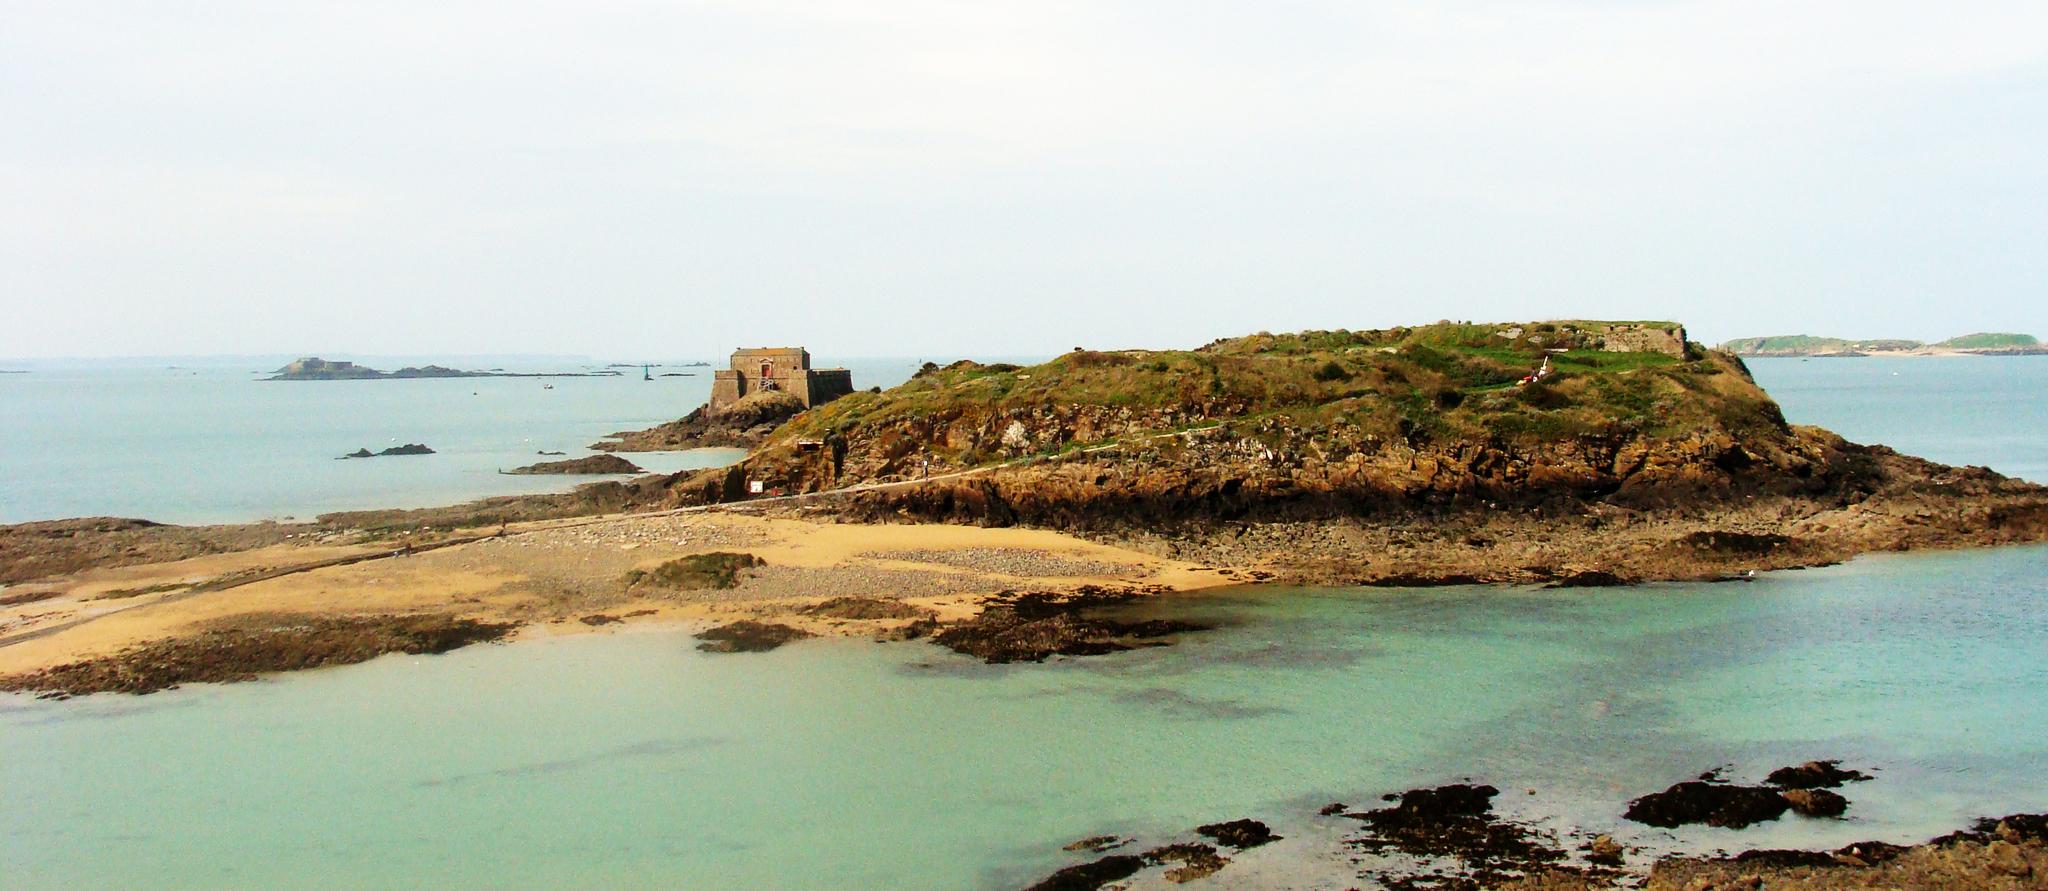 Article_Saint_Malo_Gd_Be_Petit_Be